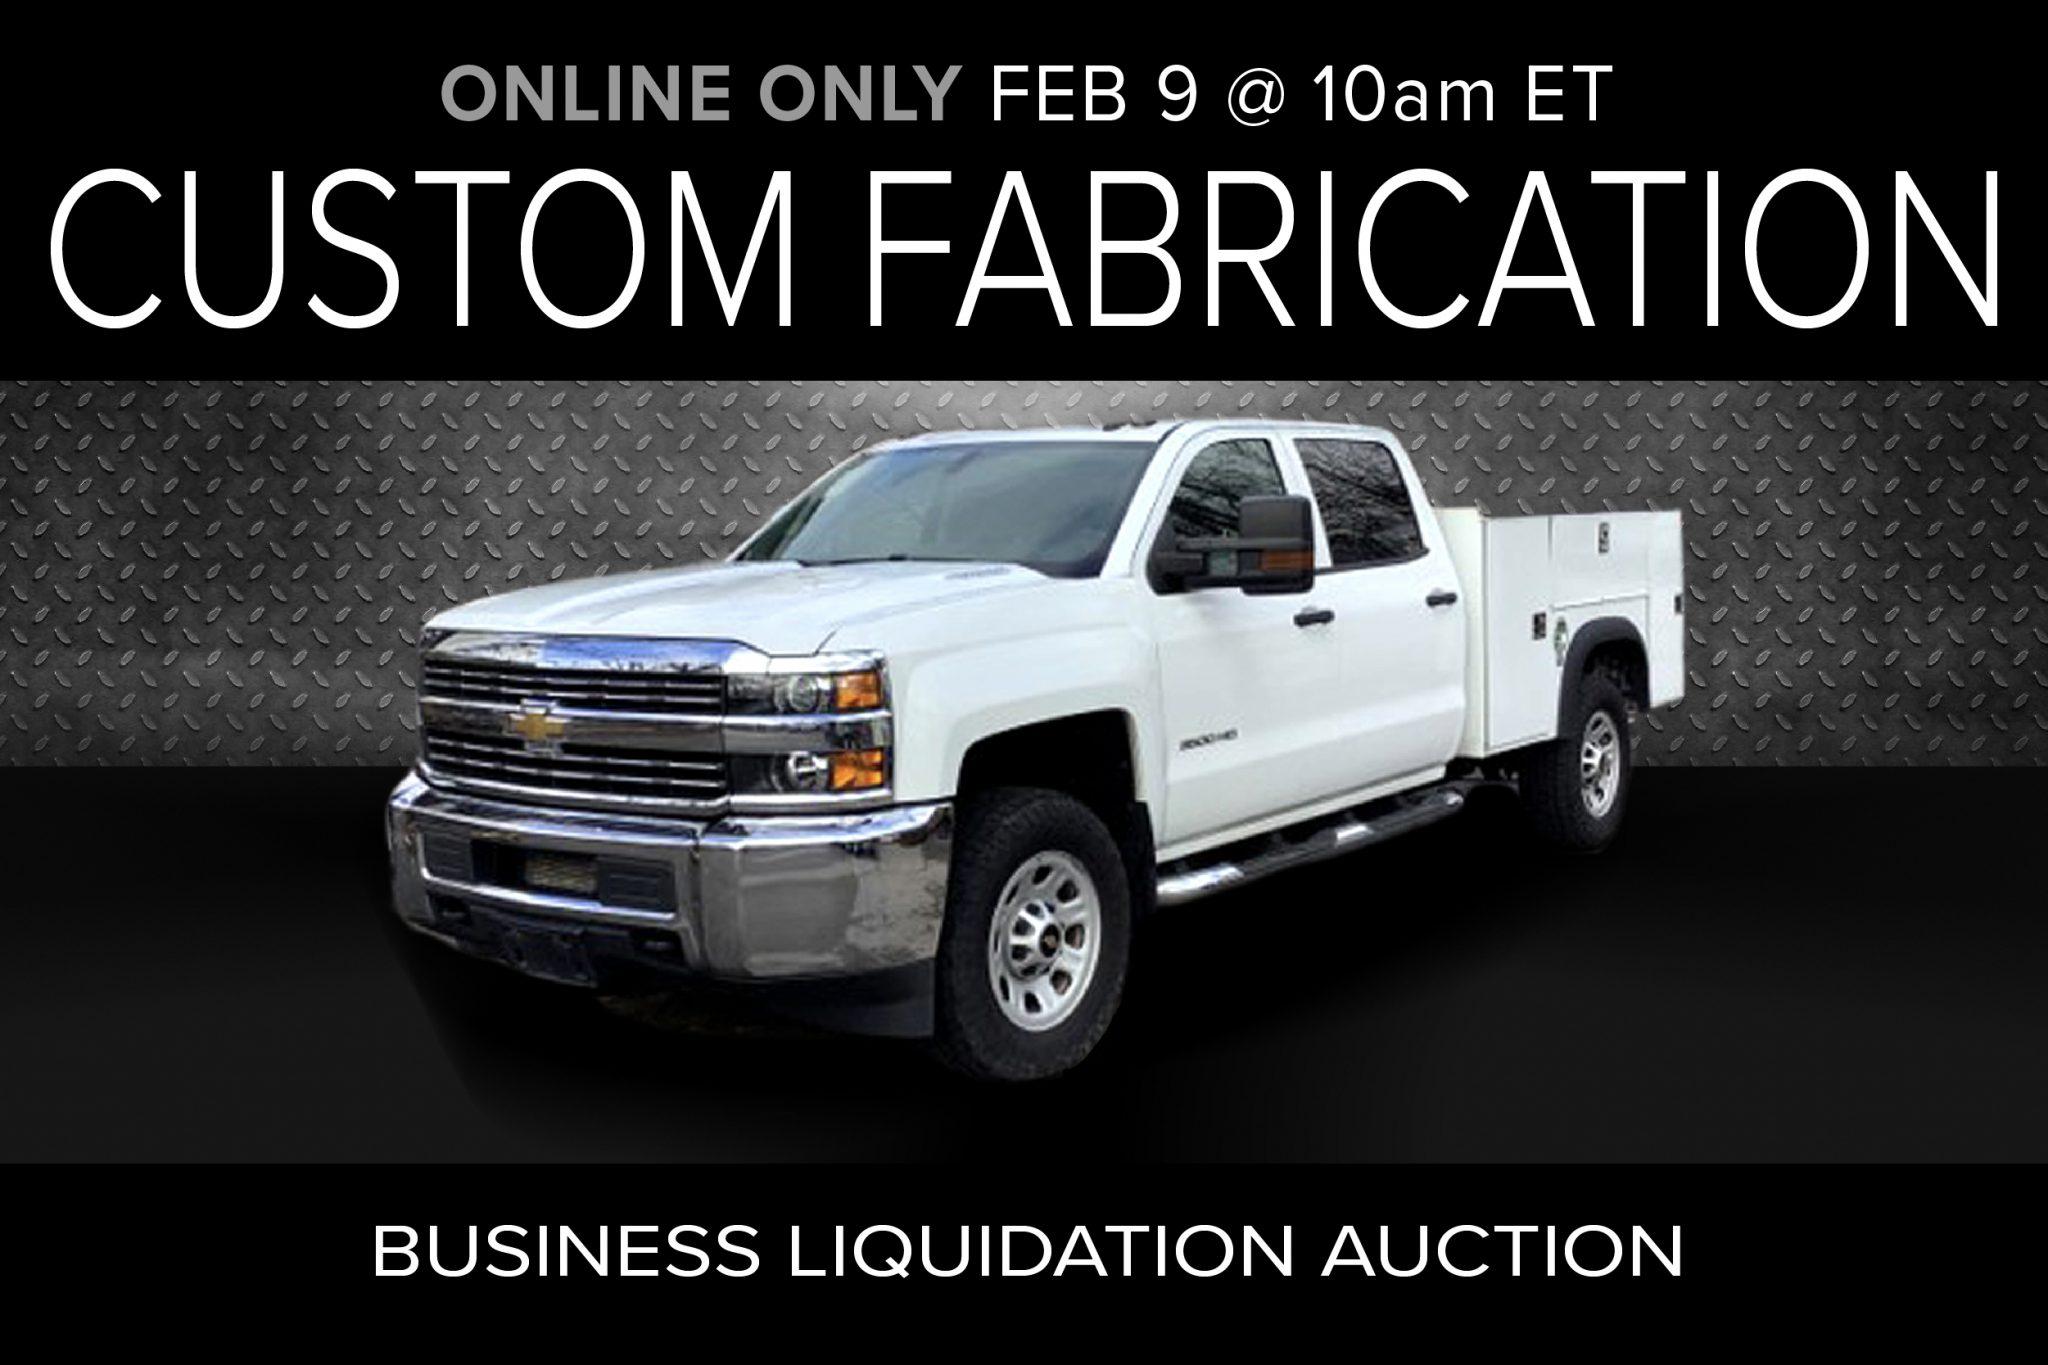 Custom Fabrication Business Liquidation Auction